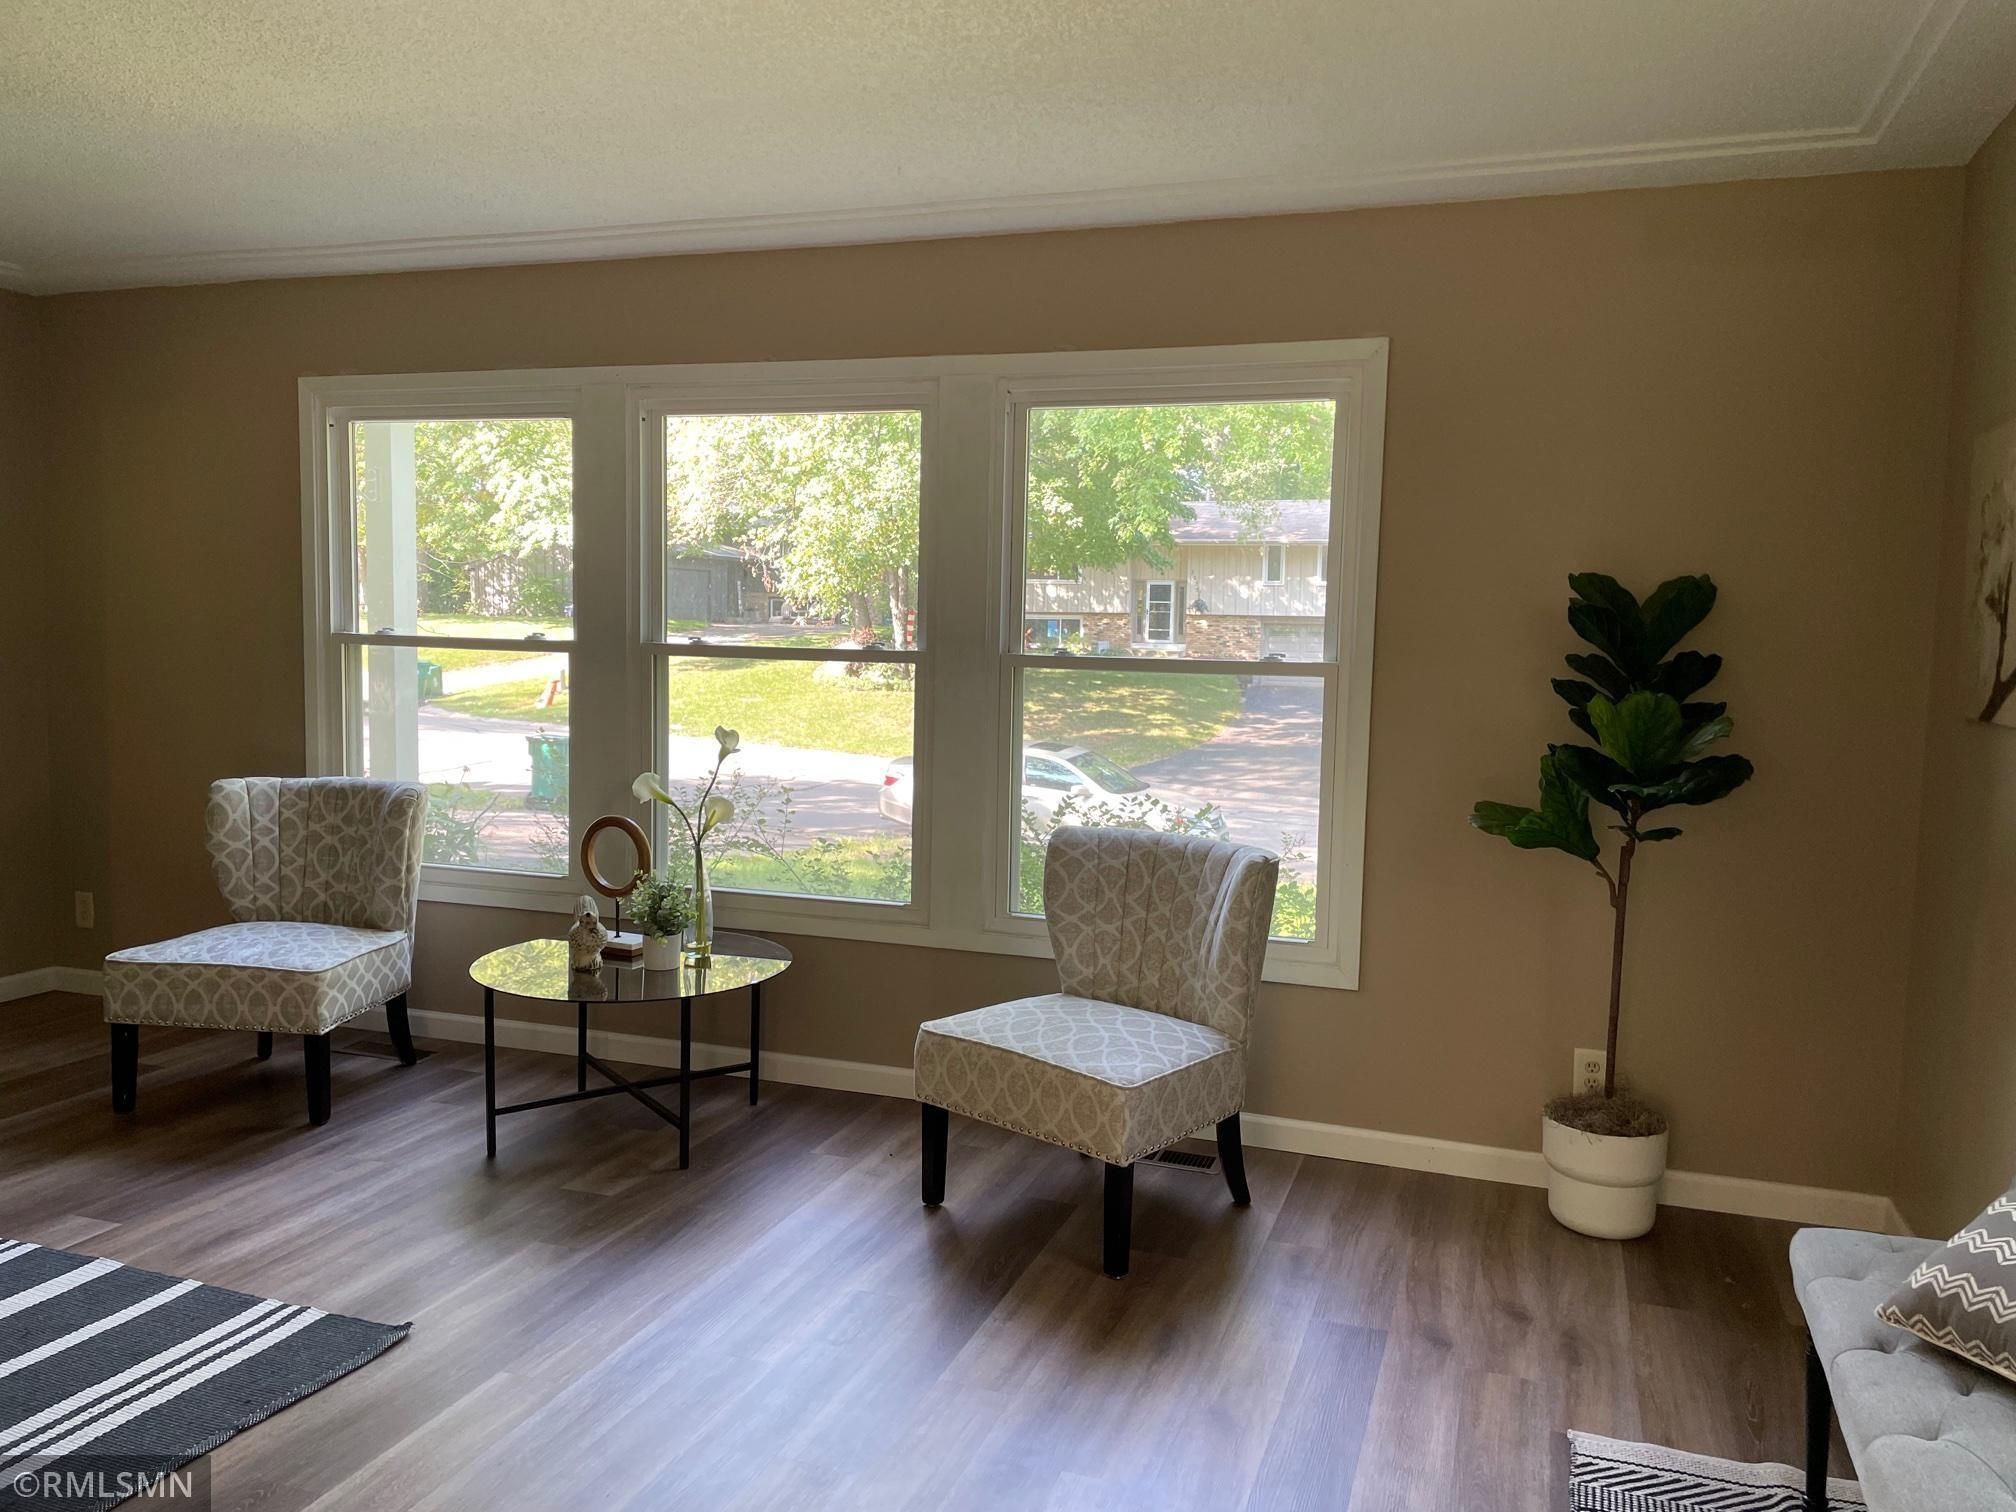 3340 Vagabond Lane, Plymouth, Minnesota 55447, 4 Bedrooms Bedrooms, ,2 BathroomsBathrooms,Residential,For Sale,Vagabond,NST6099159